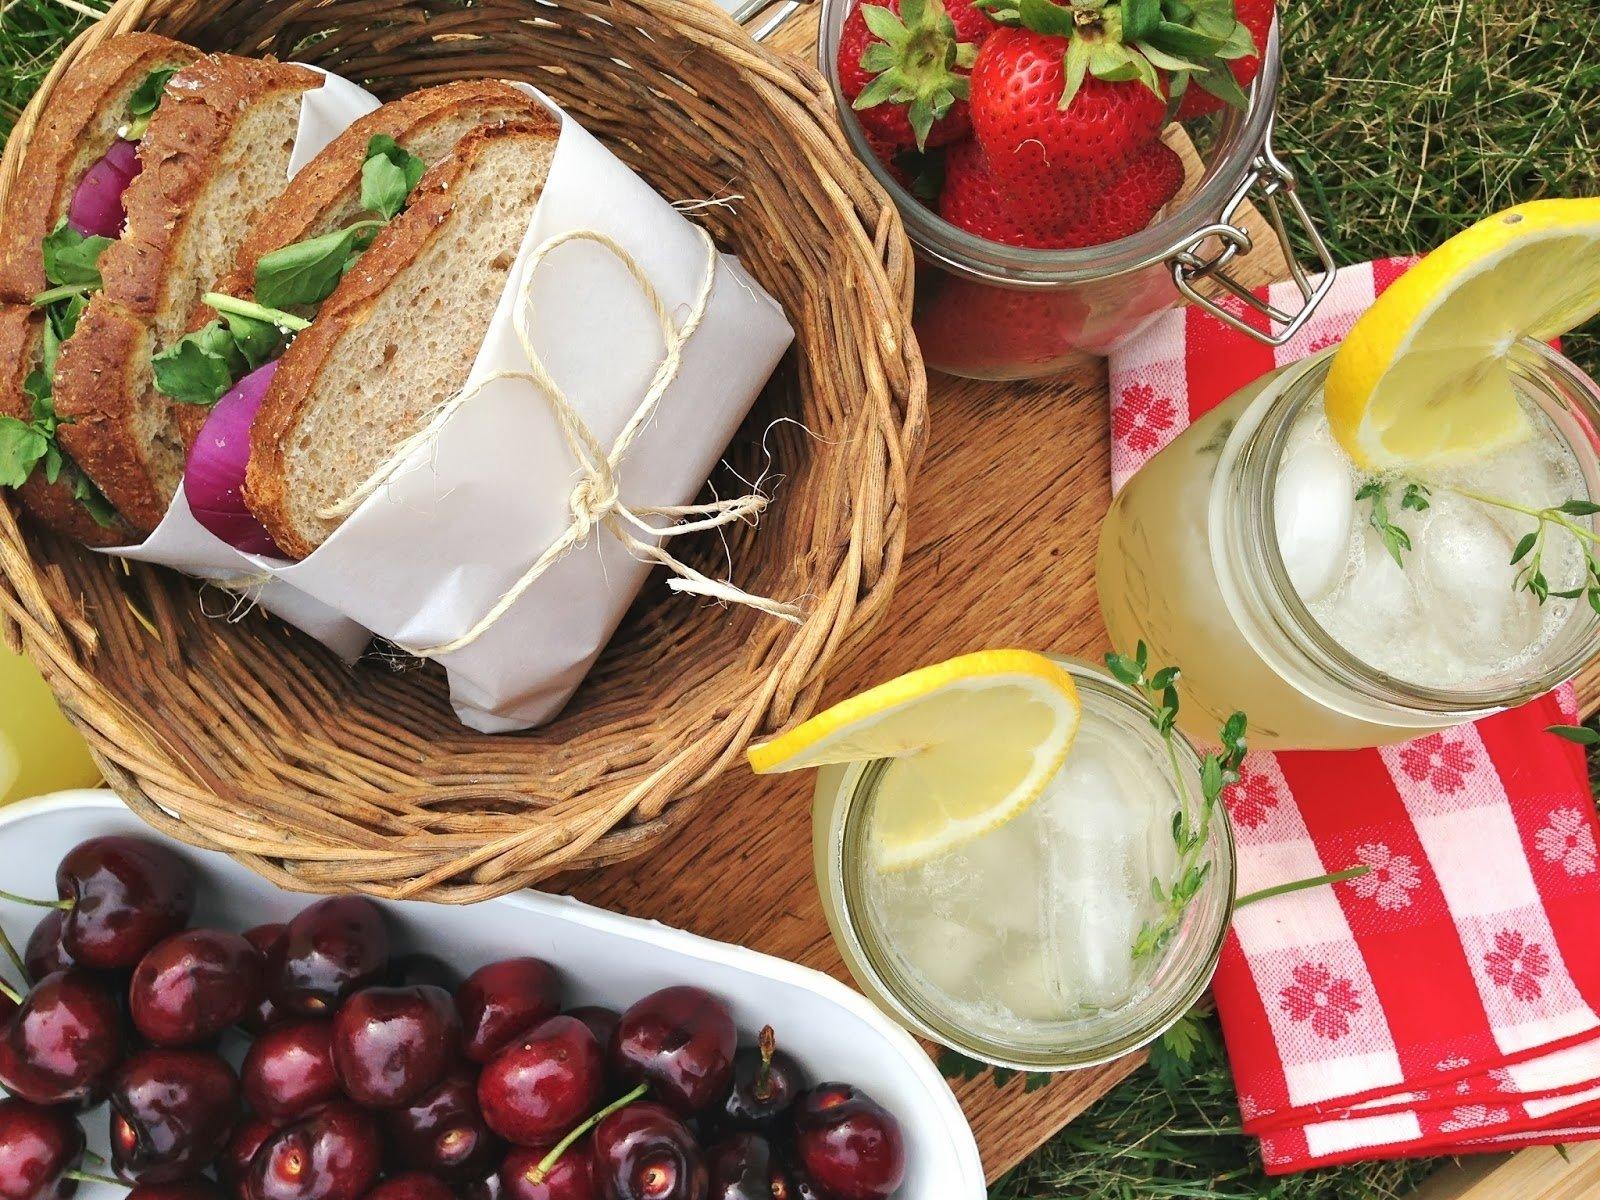 10 Beautiful Picnic Food Ideas For Couples picnic date night e29da3 pinterest picnics picnic foods and food 1 2021